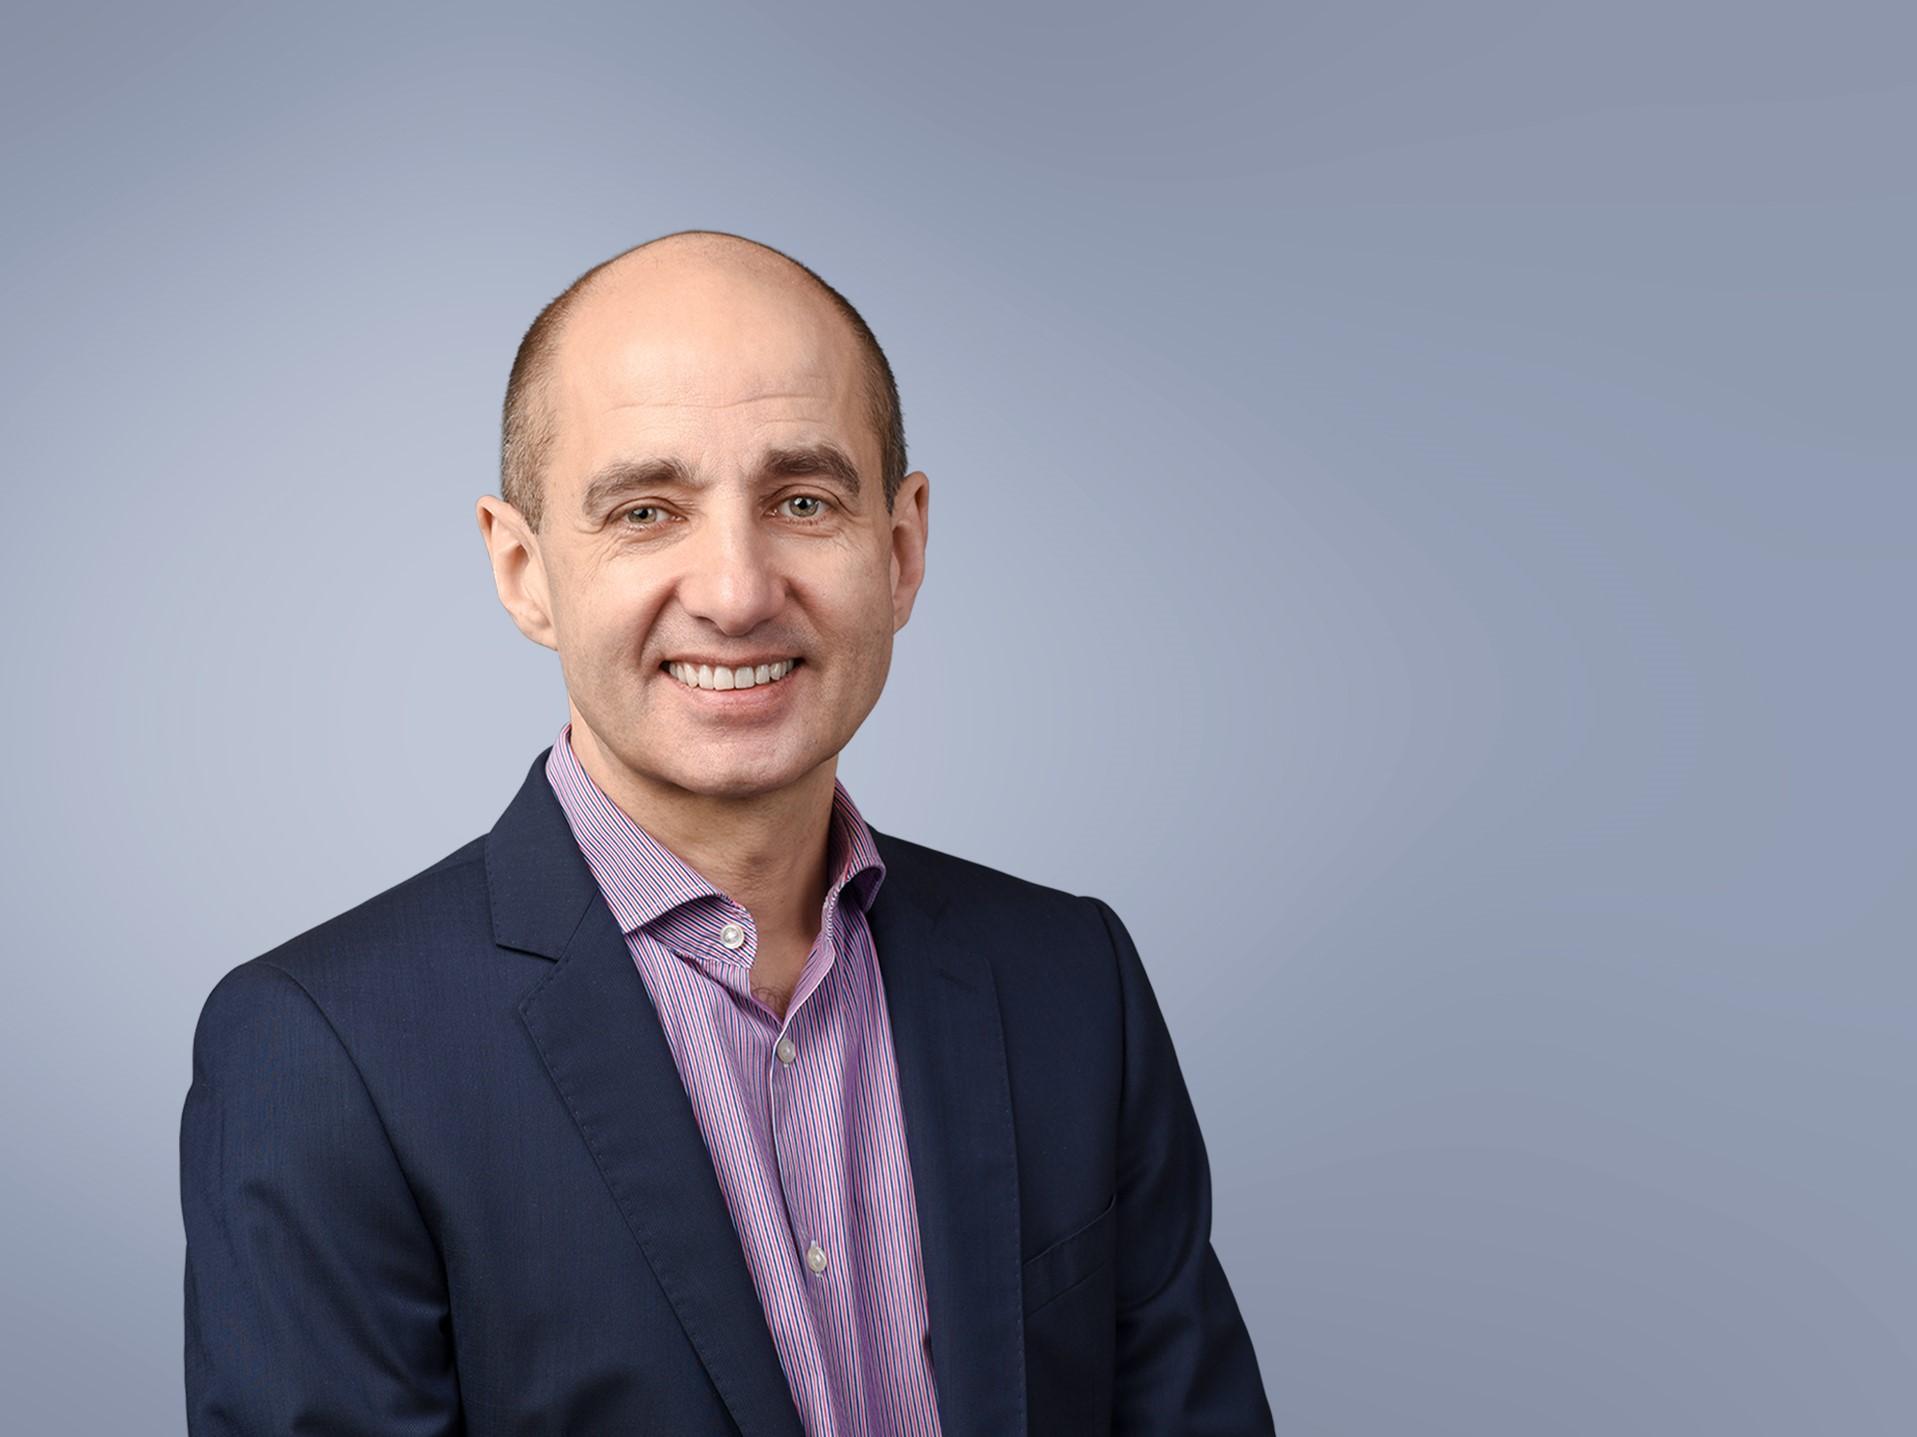 Robert Scherrer - Management Consultant und Certified Partner - Project Competence – Digitale Transformationen, IT-Strategie, Coaching